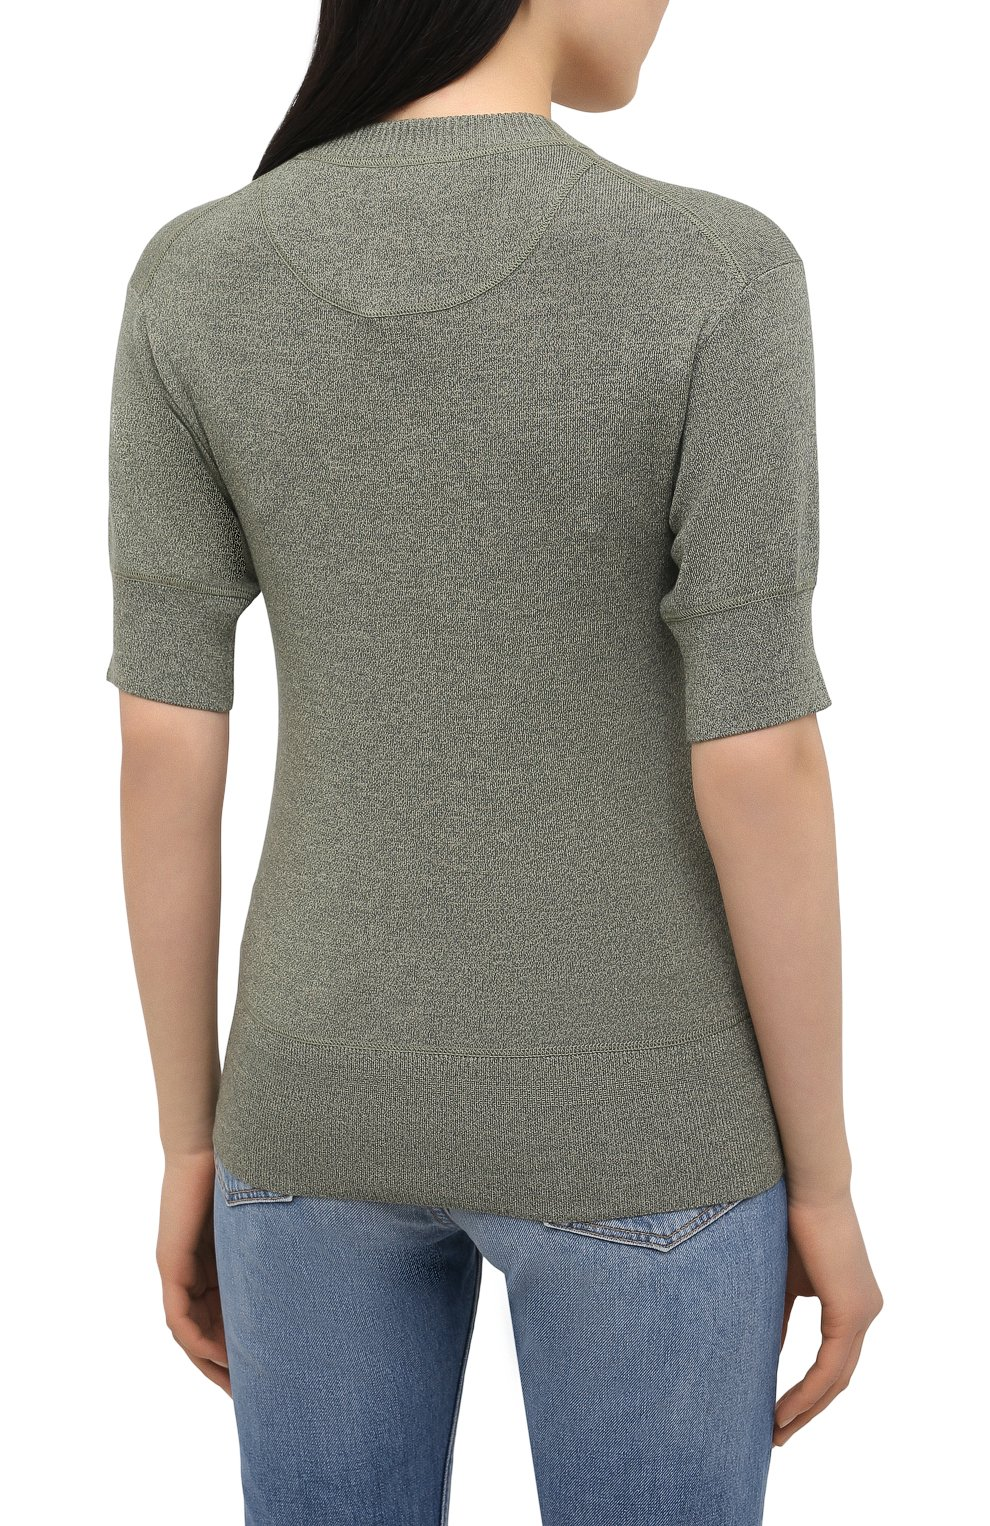 Женский пуловер из шерсти и хлопка KENZO хаки цвета, арт. FB52PU5553AB | Фото 4